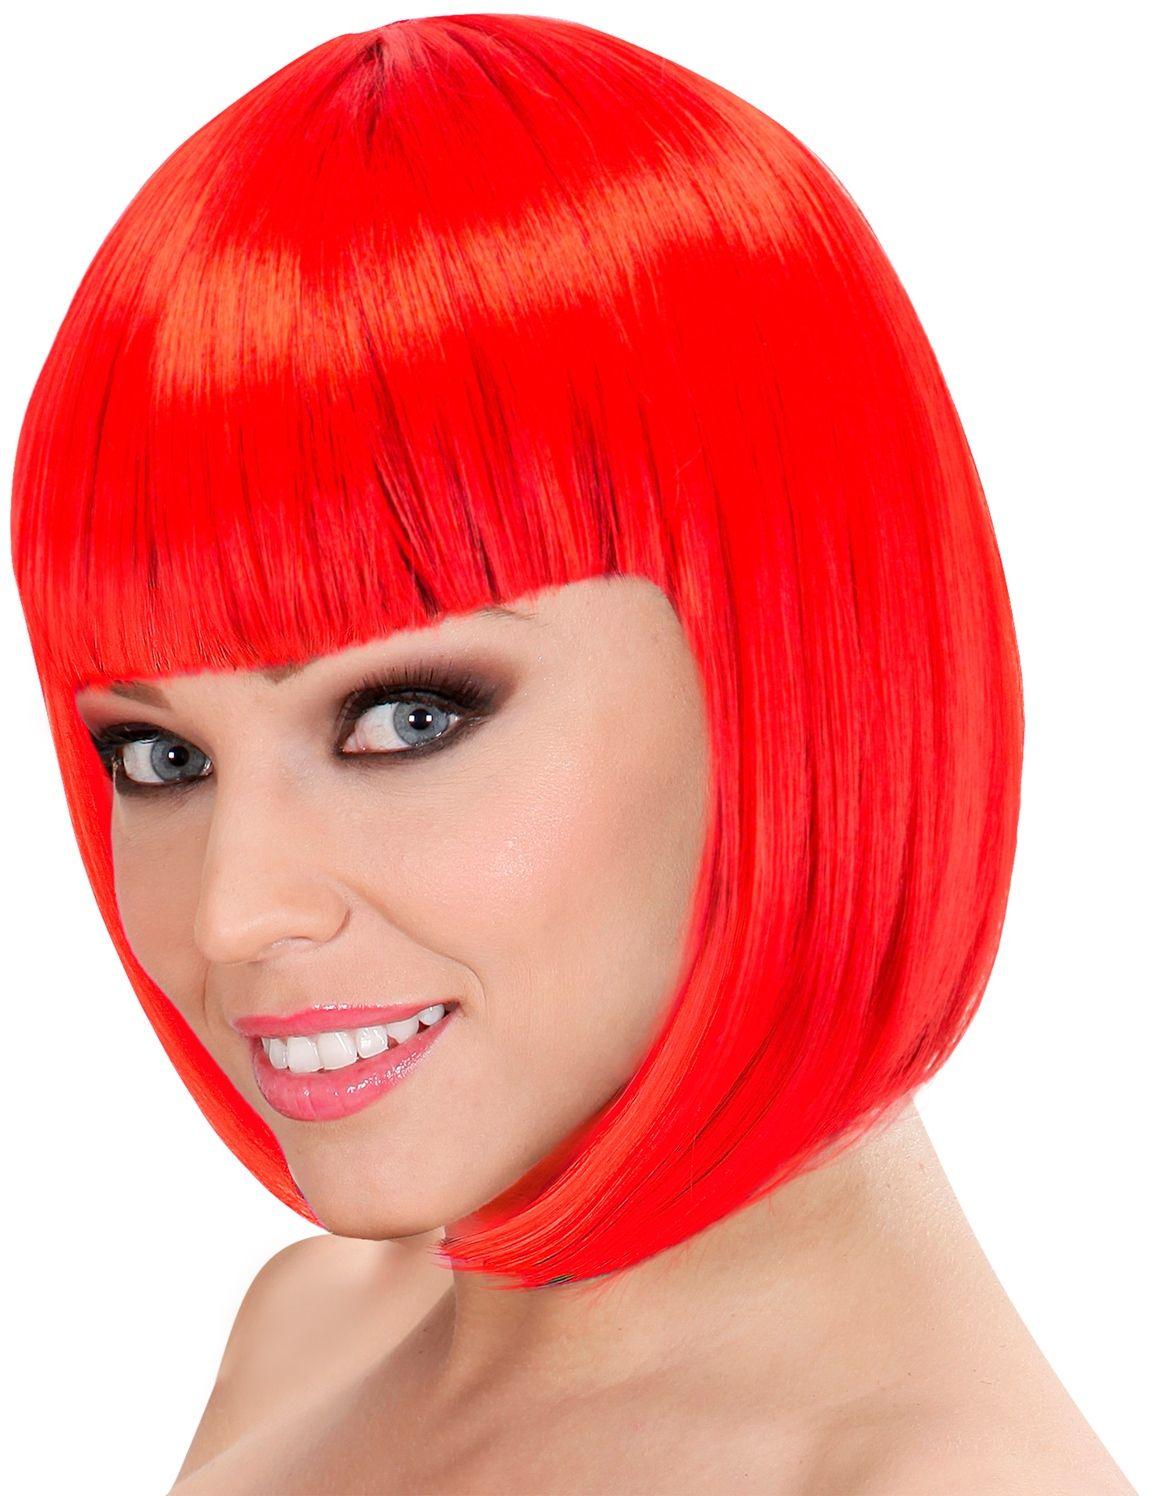 Lou Lou pruik rood